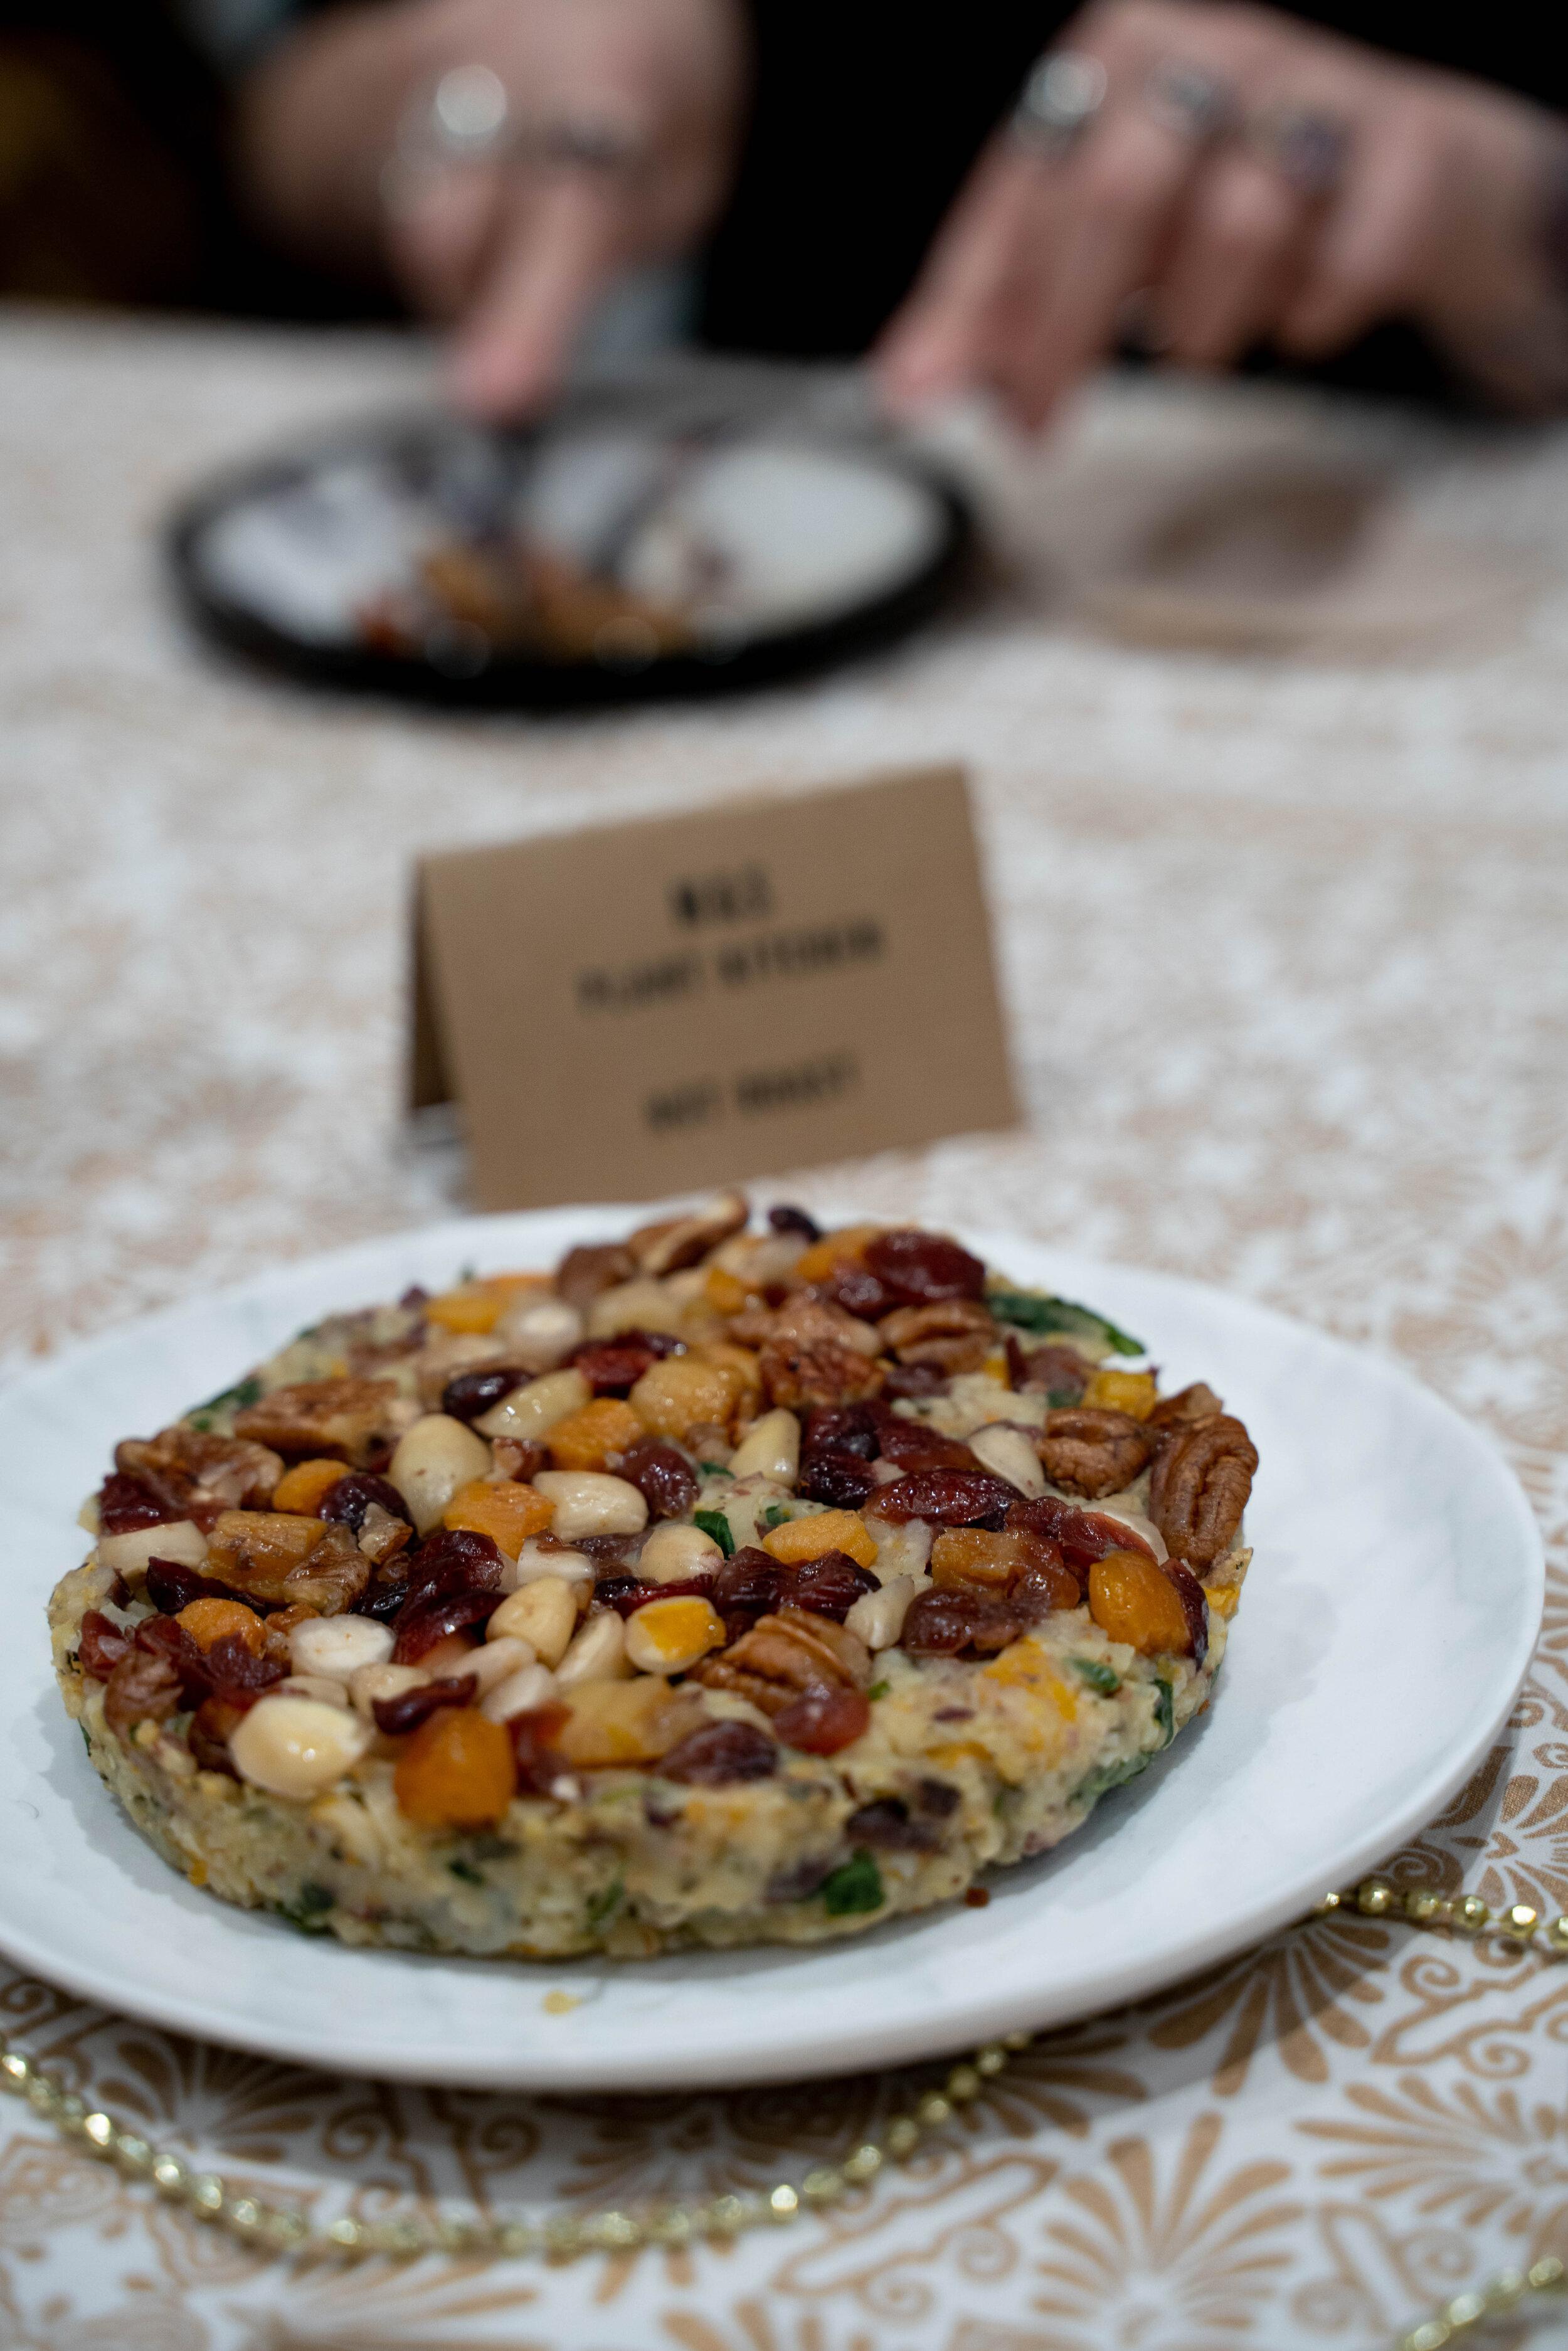 Vegan Lifestyle Bright Zine Vegan Christmas Food Guide